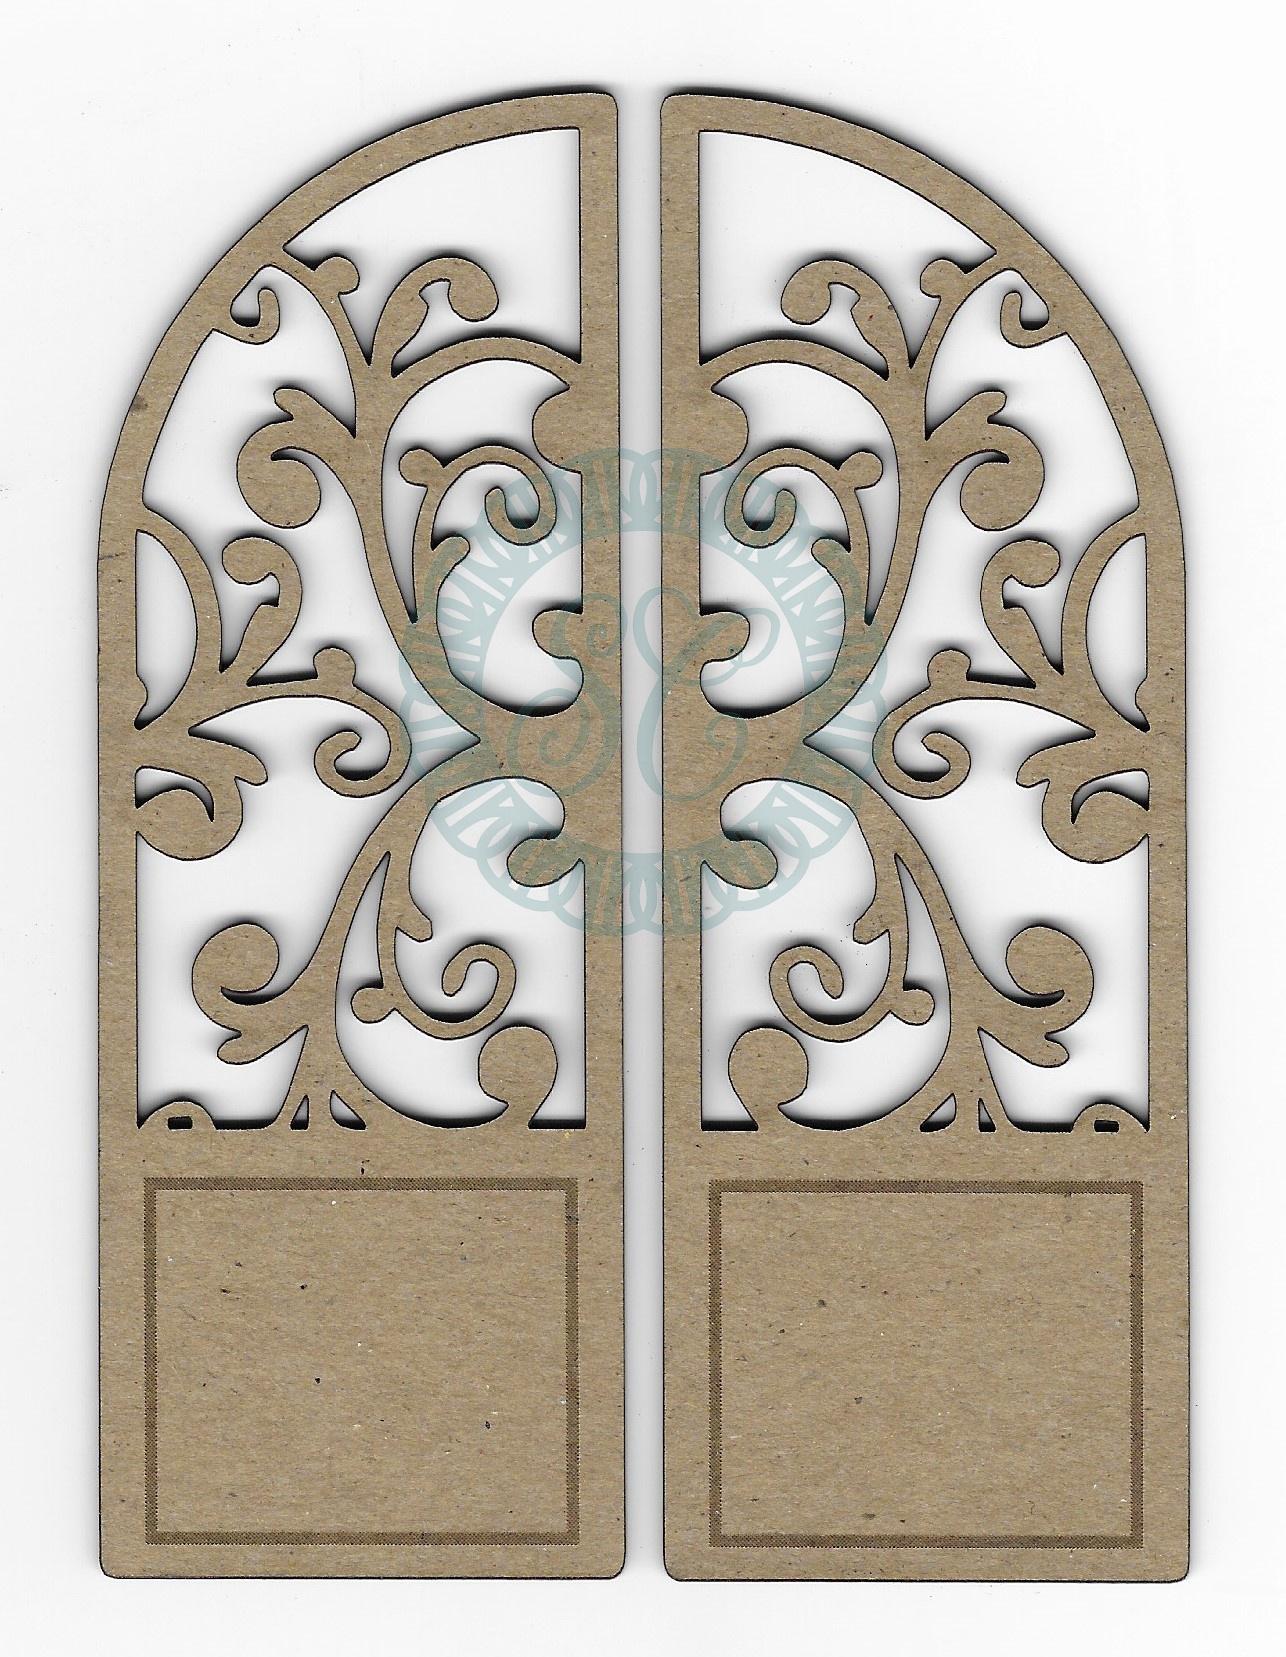 Scrapaholics Laser Cut Chipboard 1.8mm Thick-Arched Florish Door, 2/Pkg, 5X3.75...